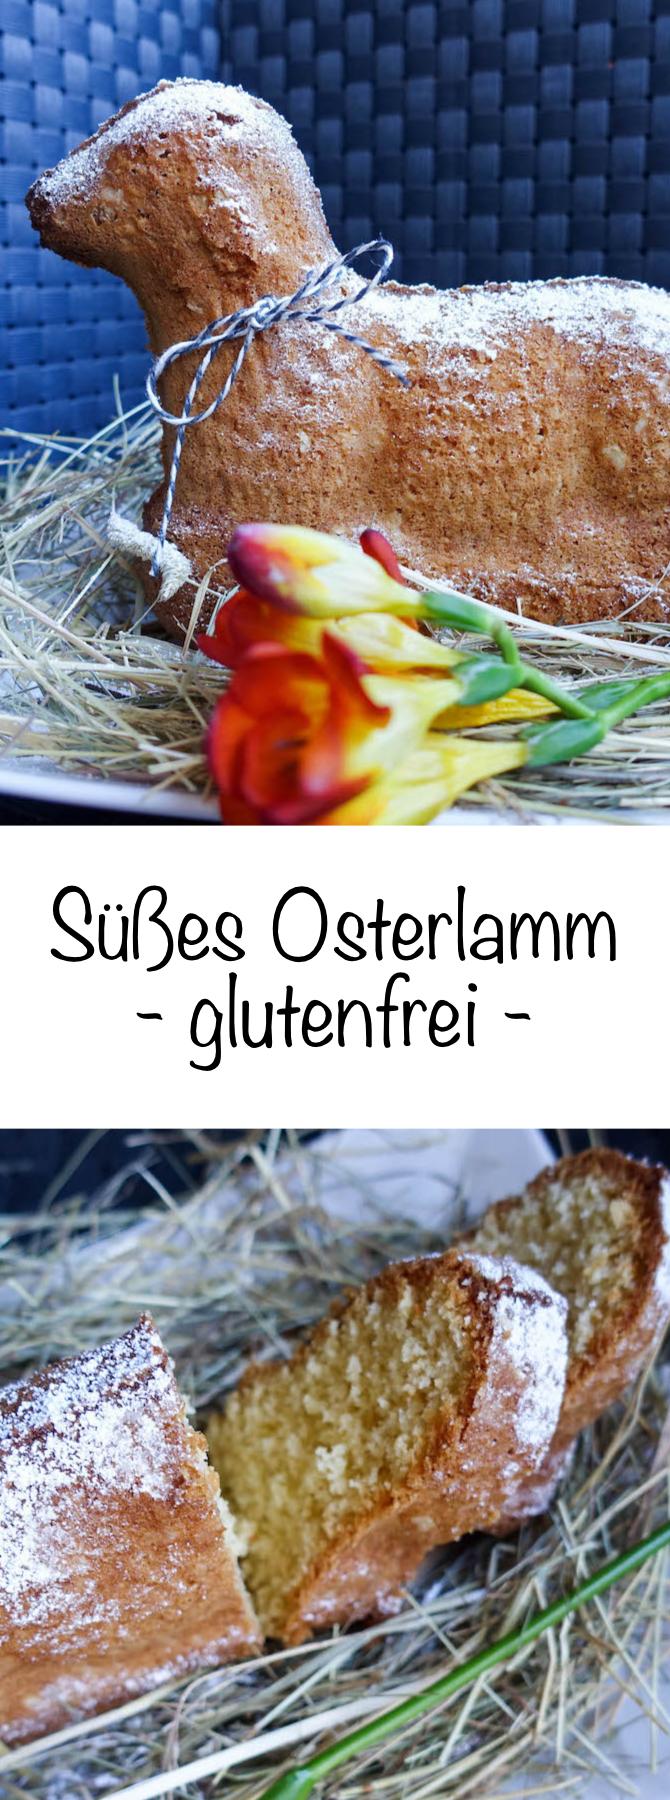 osterlamm_glutenfrei